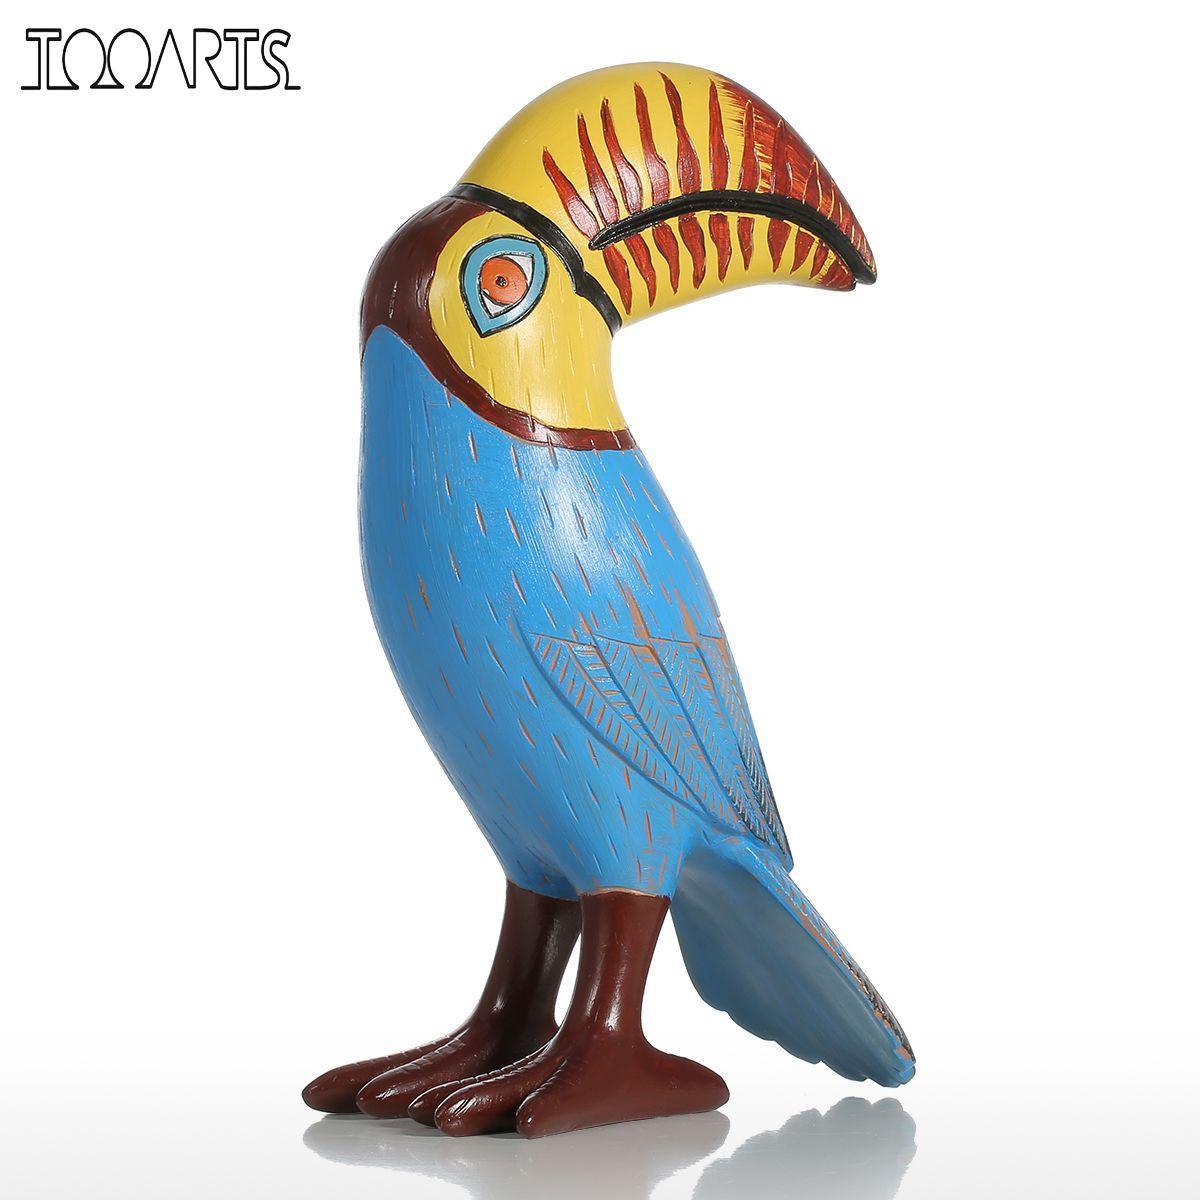 Save Big Bird >> Tooarts Big Mouth Toucan Bird Resin Sculpture Fiberglass Ornament Indoor Decor Statue Figurine ...